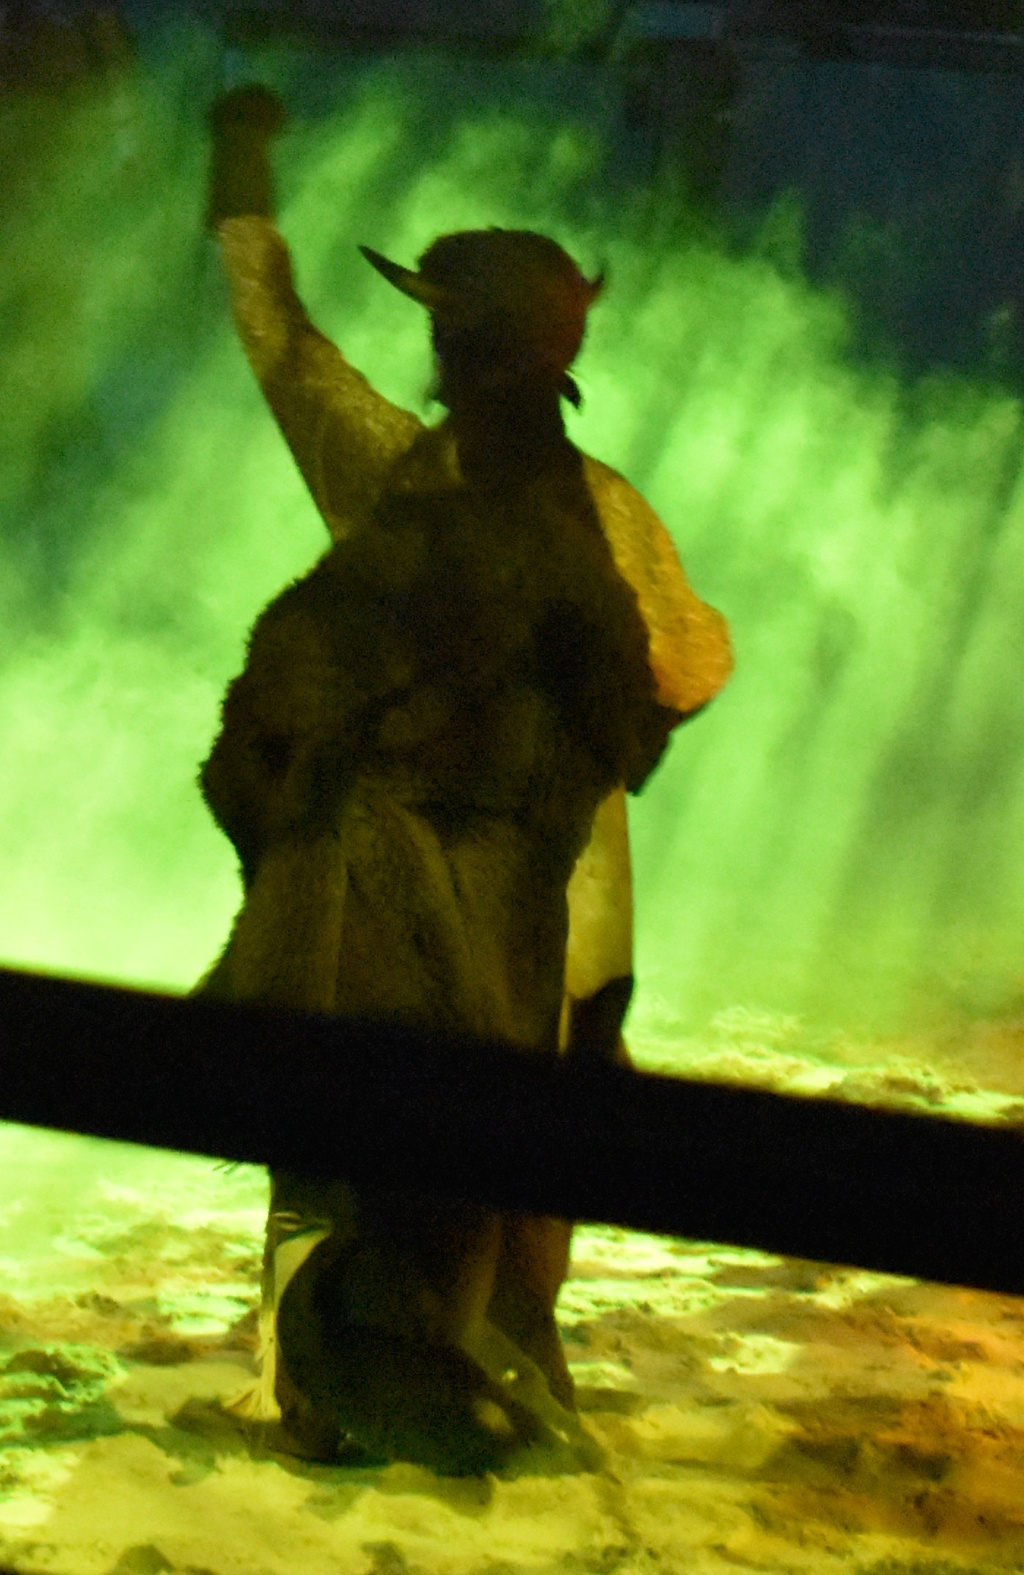 [TR] The magic must go on ♫ - Mars 2020 Buffal64